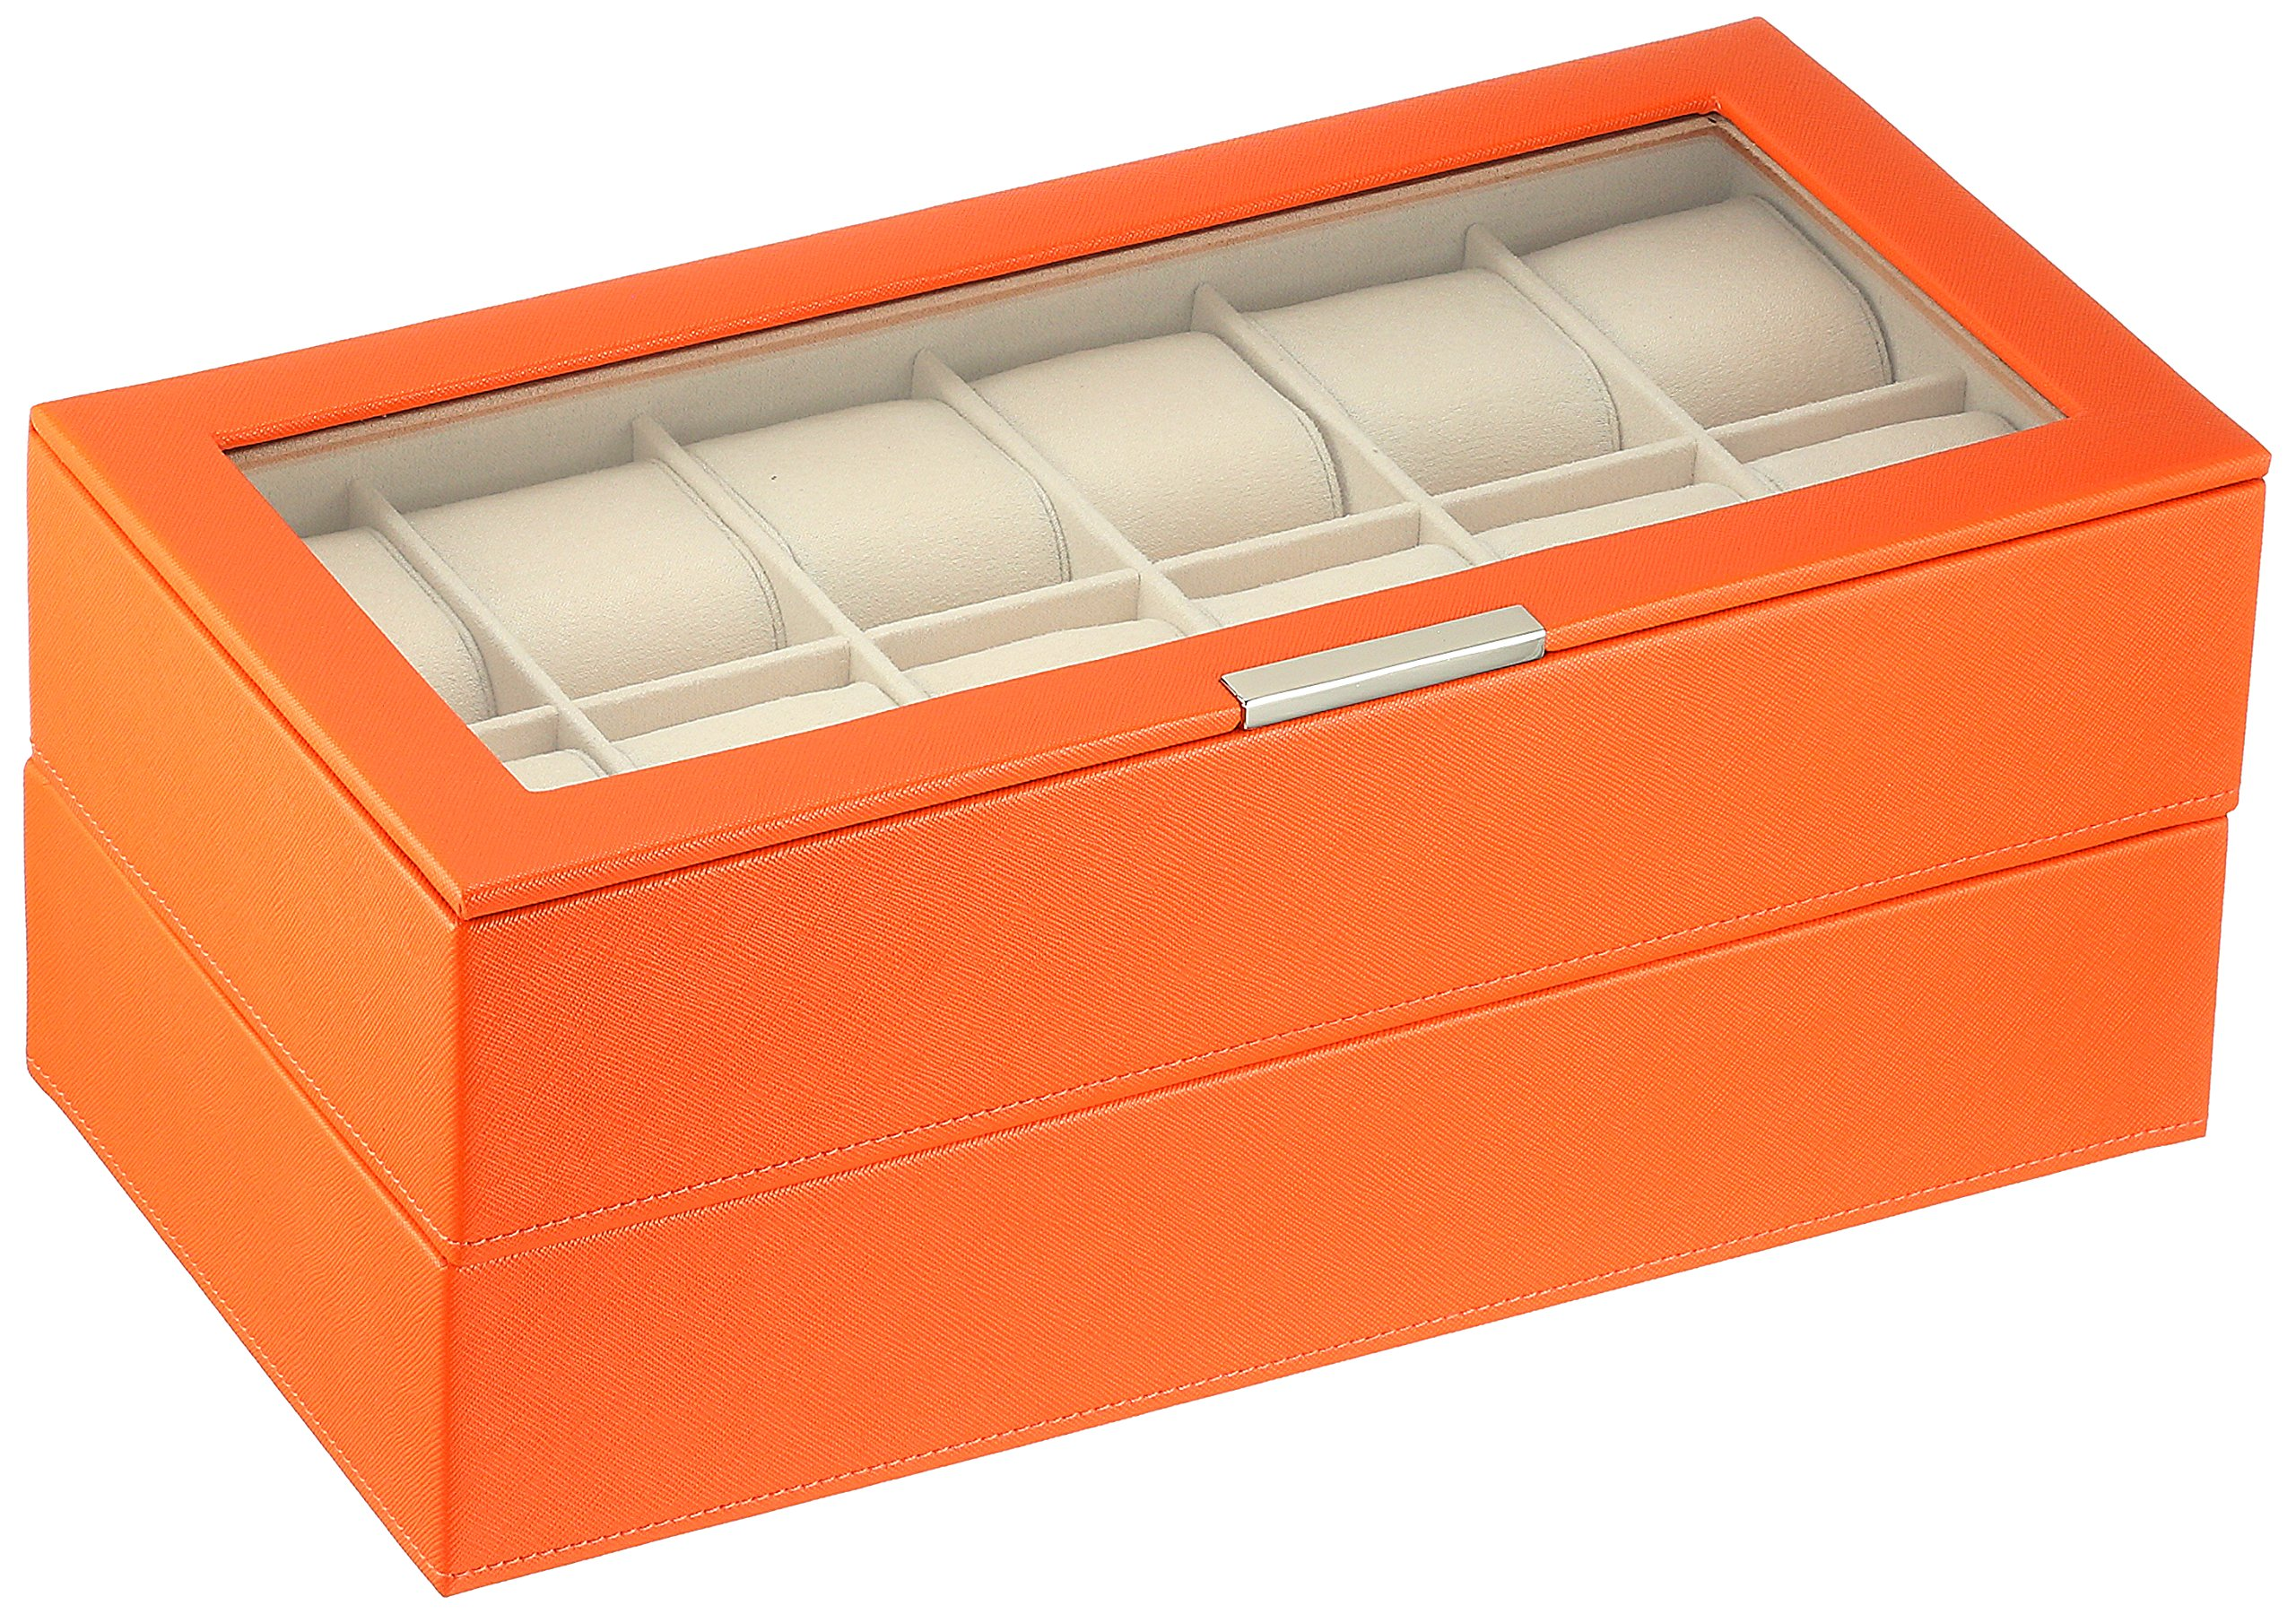 WOLF 319739 Stackable Set of 2 - 12 Piece Watch Trays, Orange